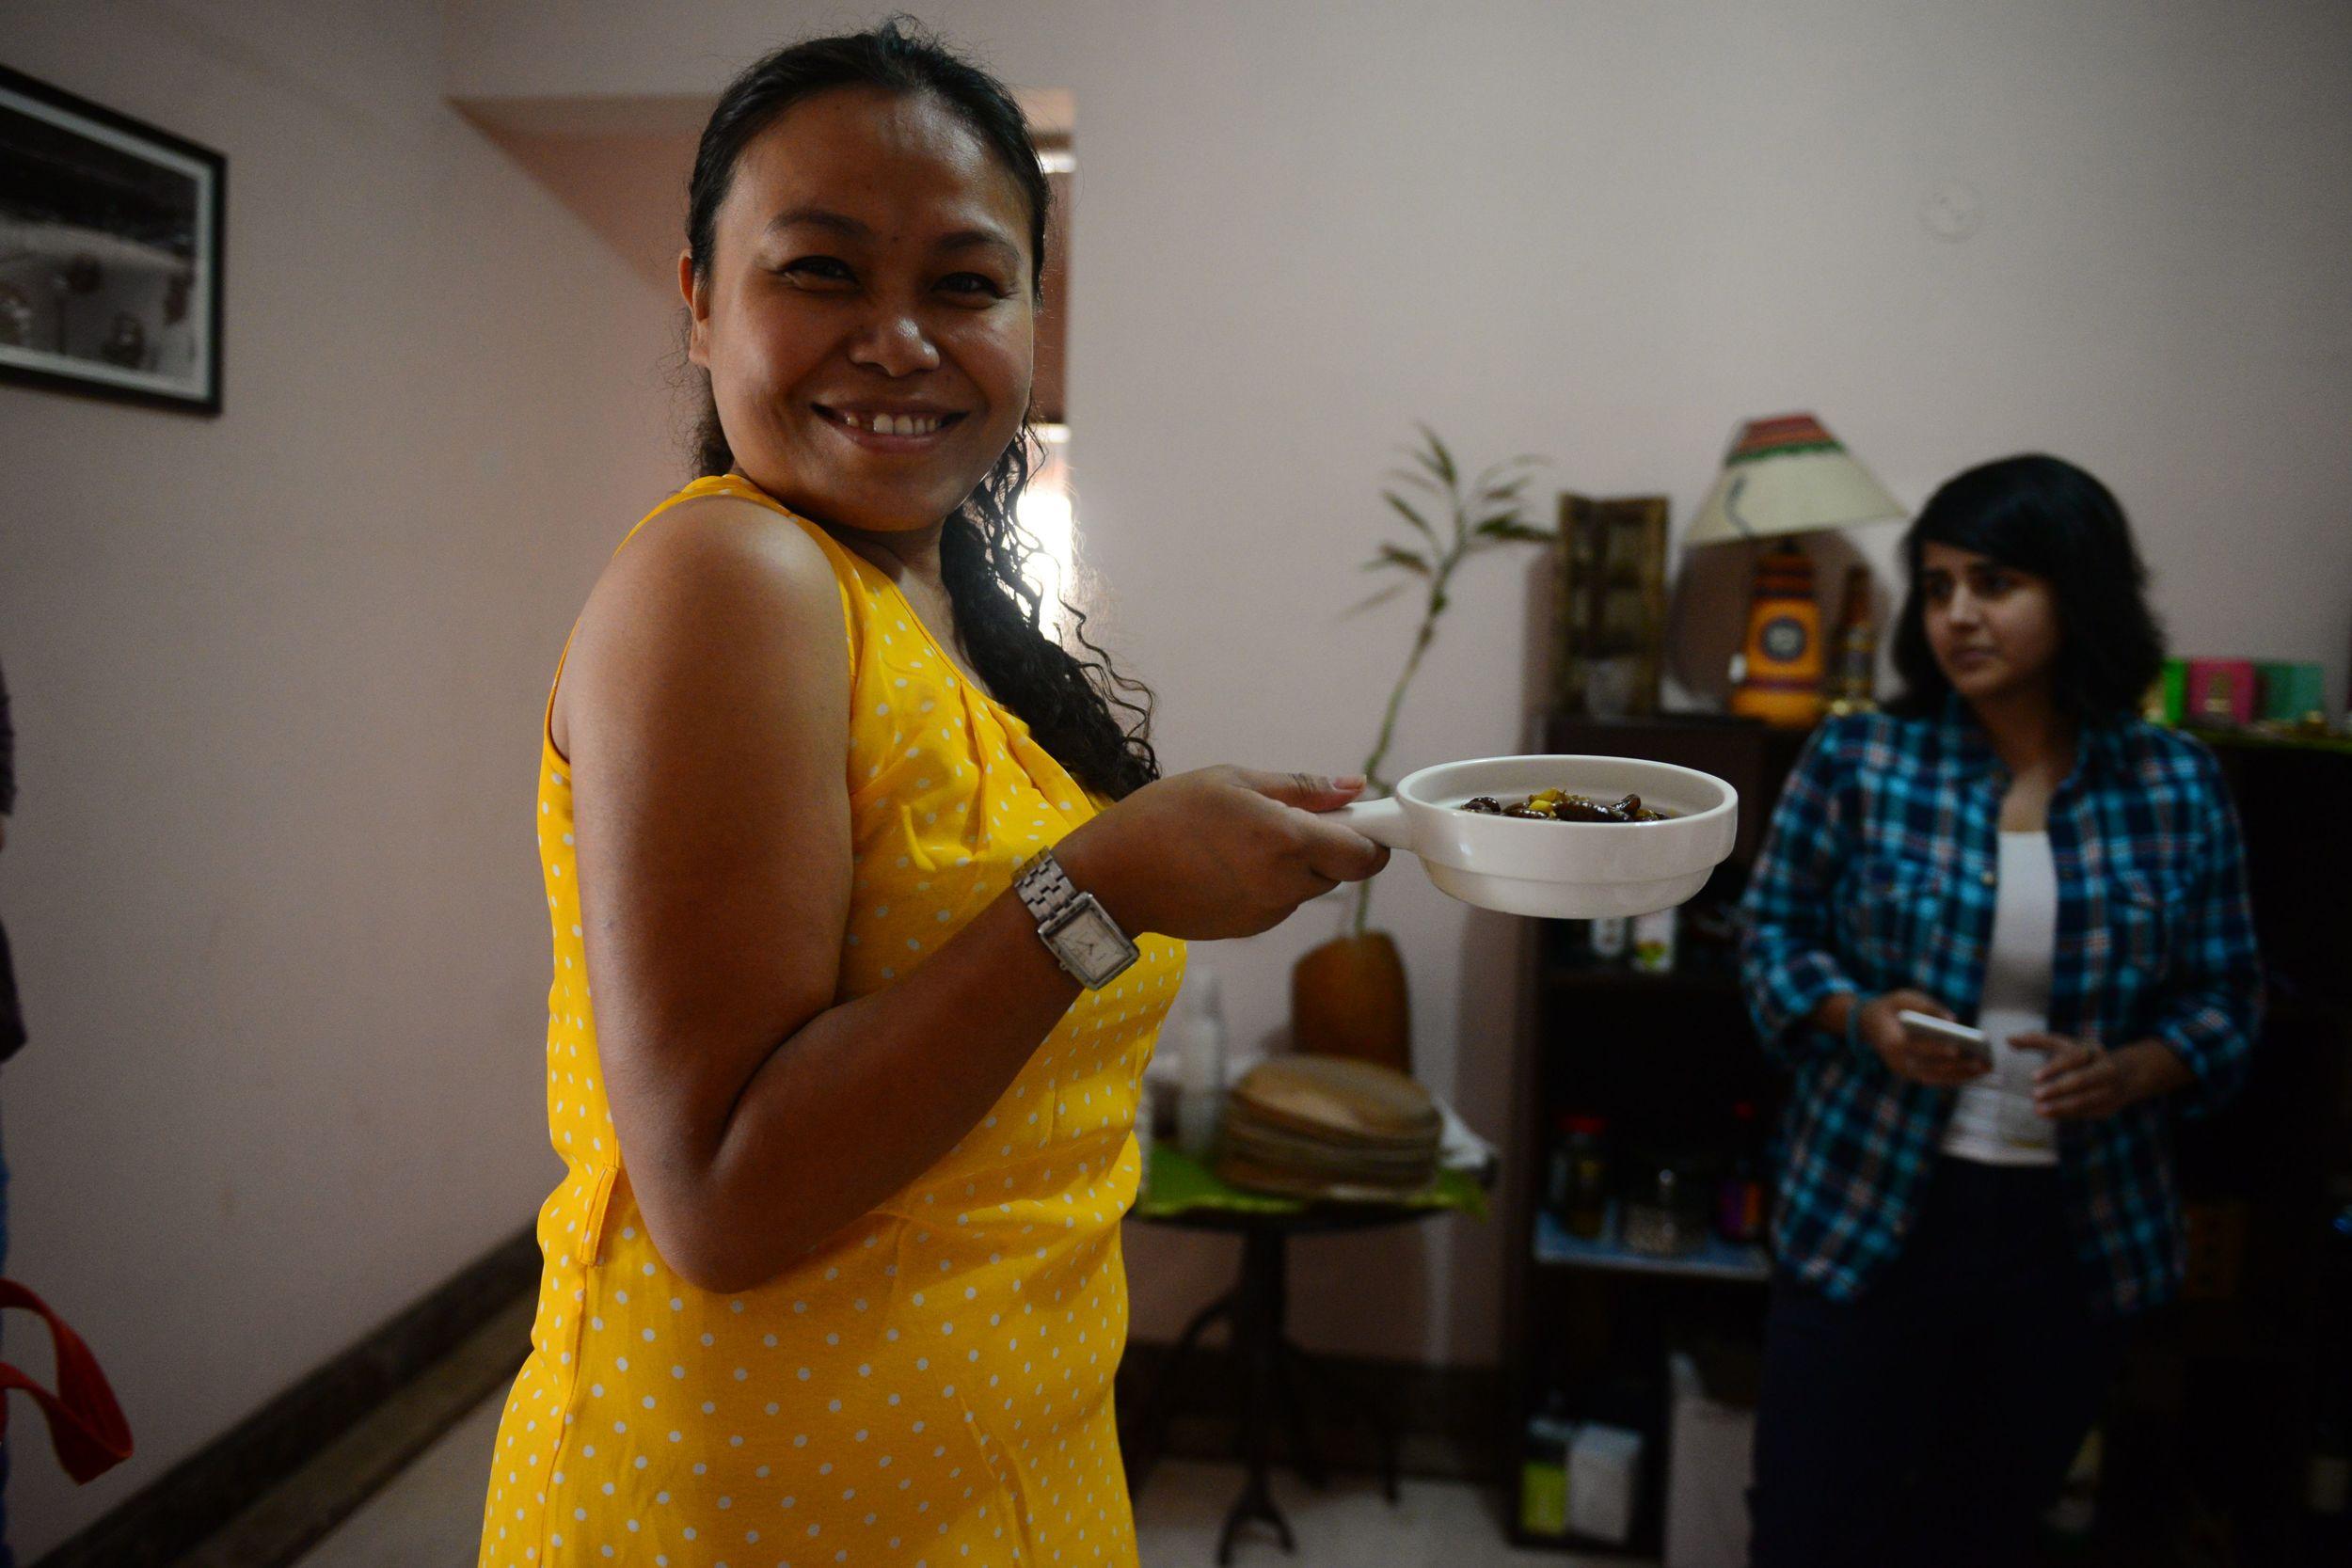 Our super enthusiastic host who made it all worth it- Gitika Saikia